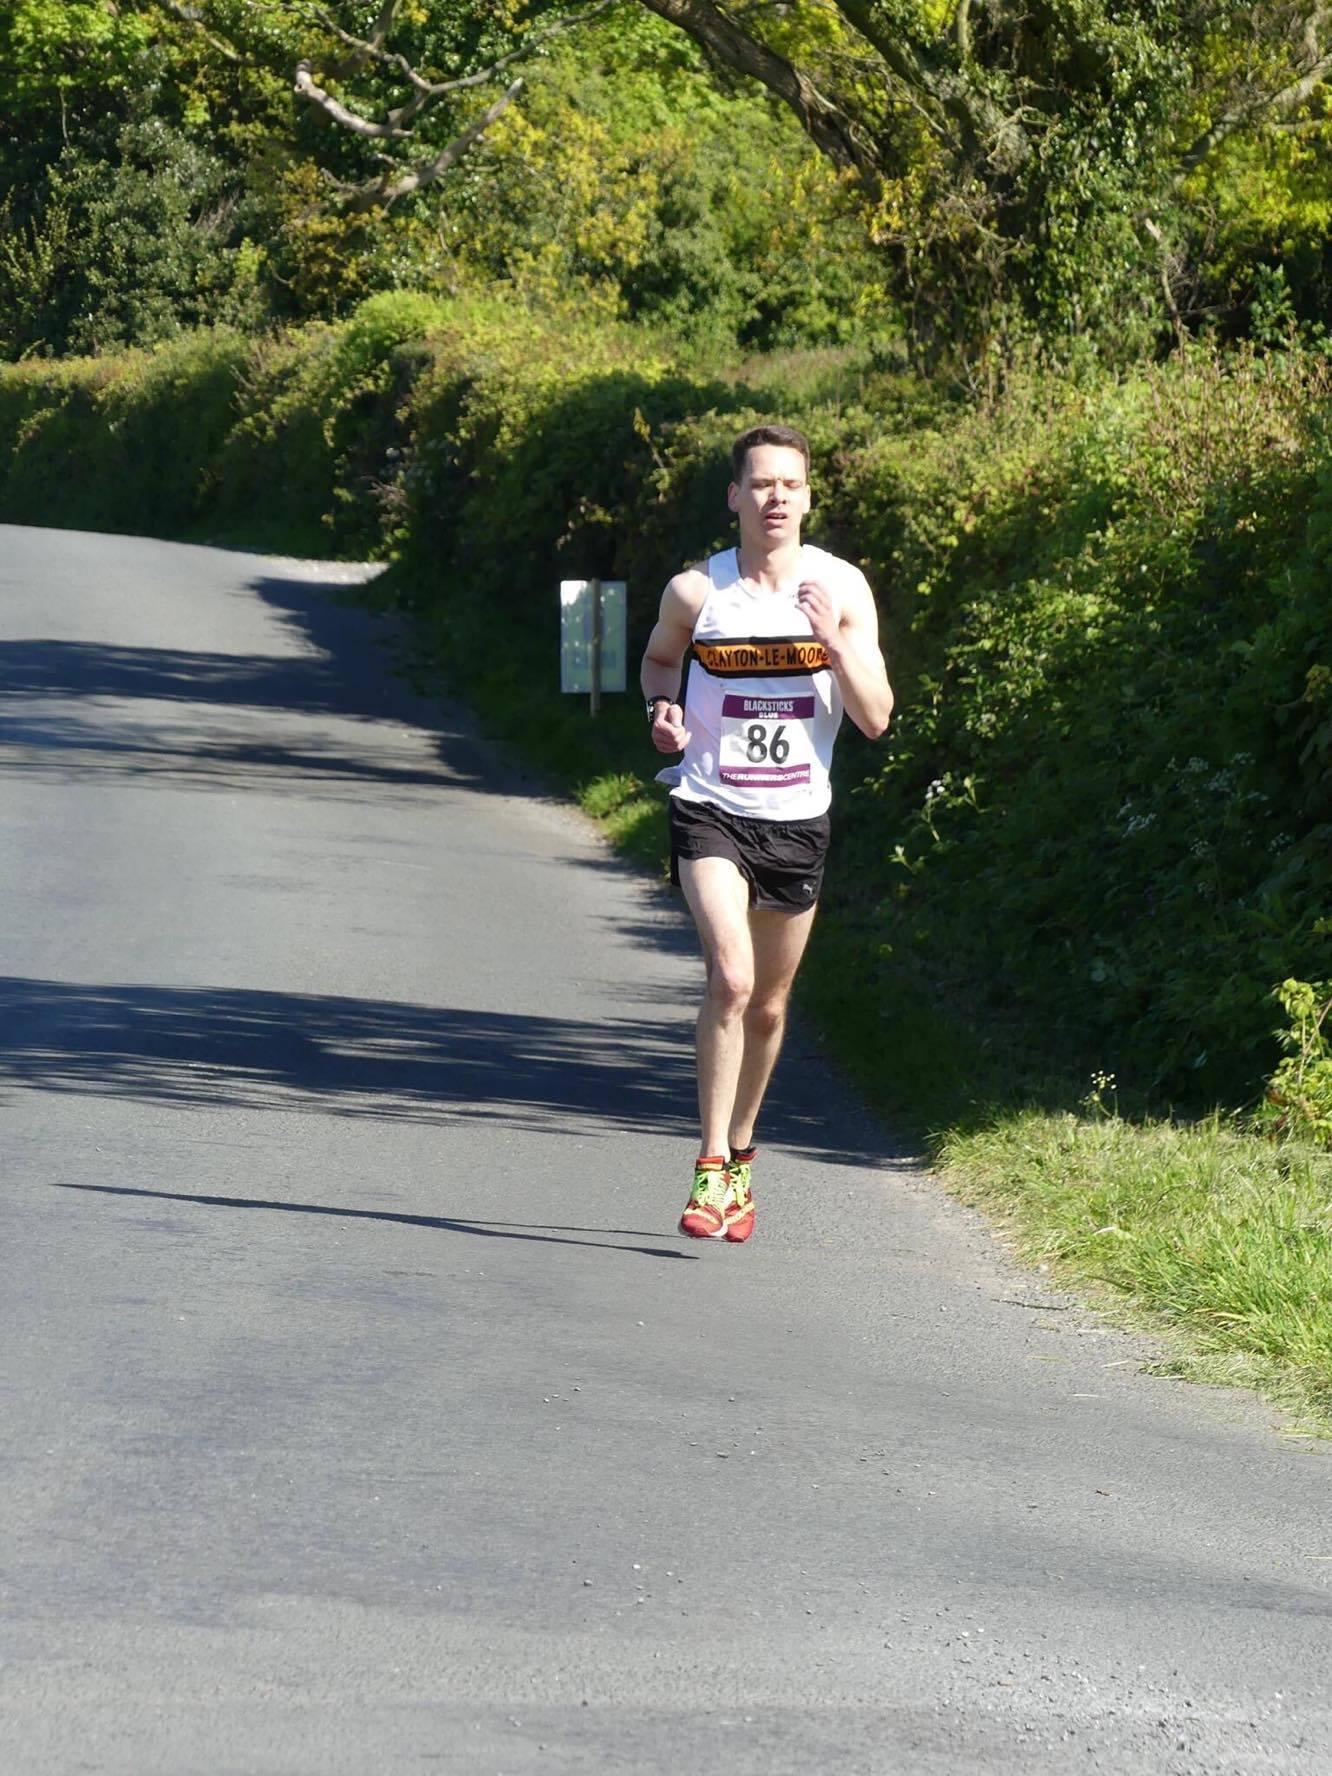 Jacob Watson at the Blacksticks Blue race.